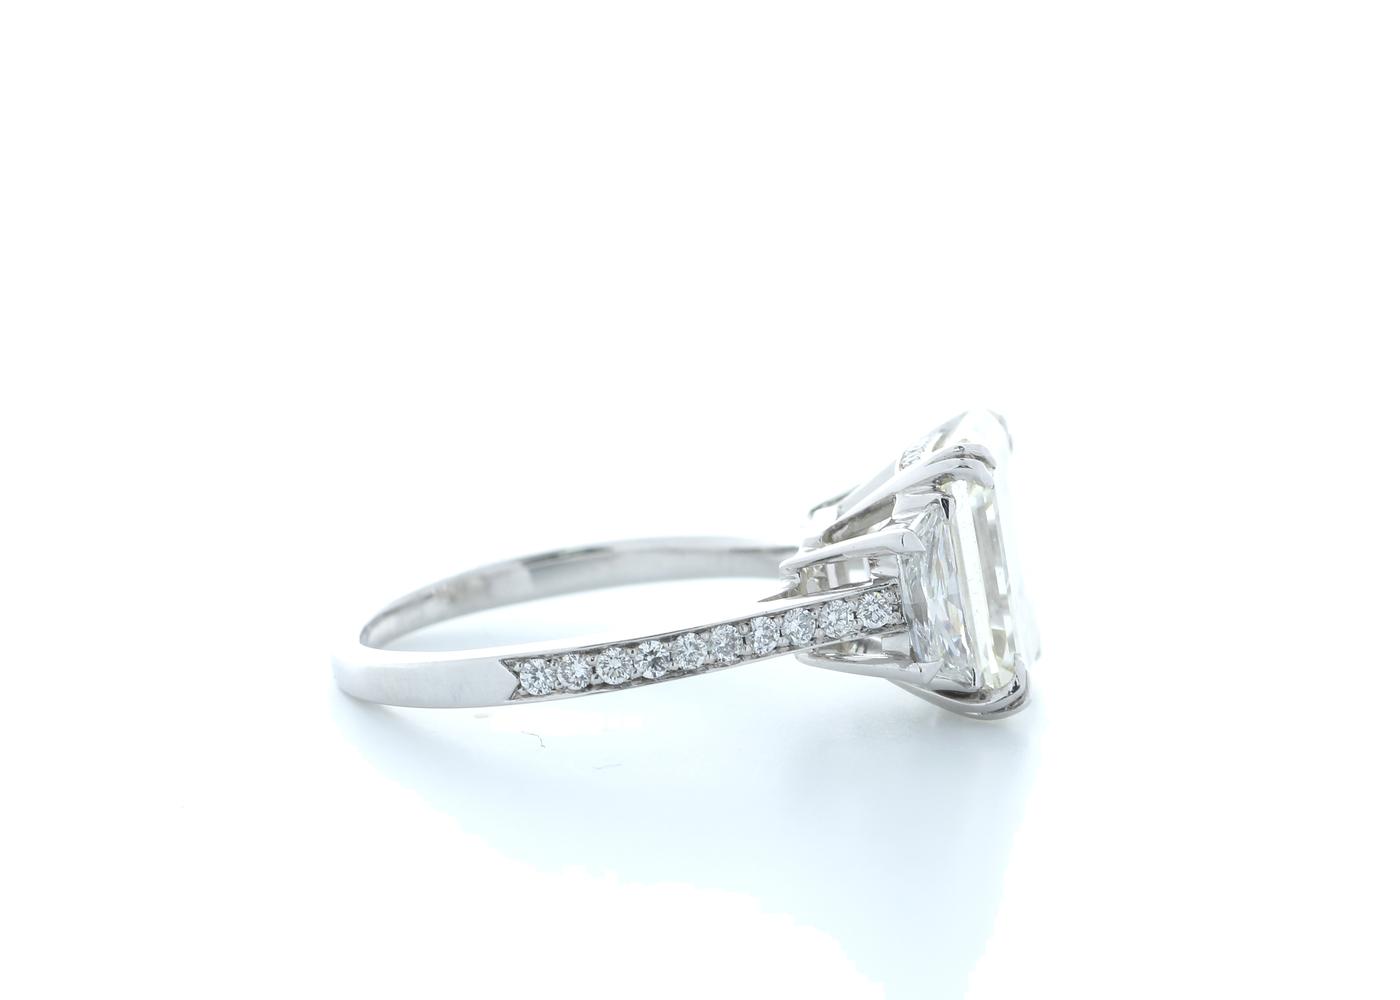 18ct White Gold Emerald Cut Diamond Ring 5.31 (4.56) Carats - Image 4 of 5